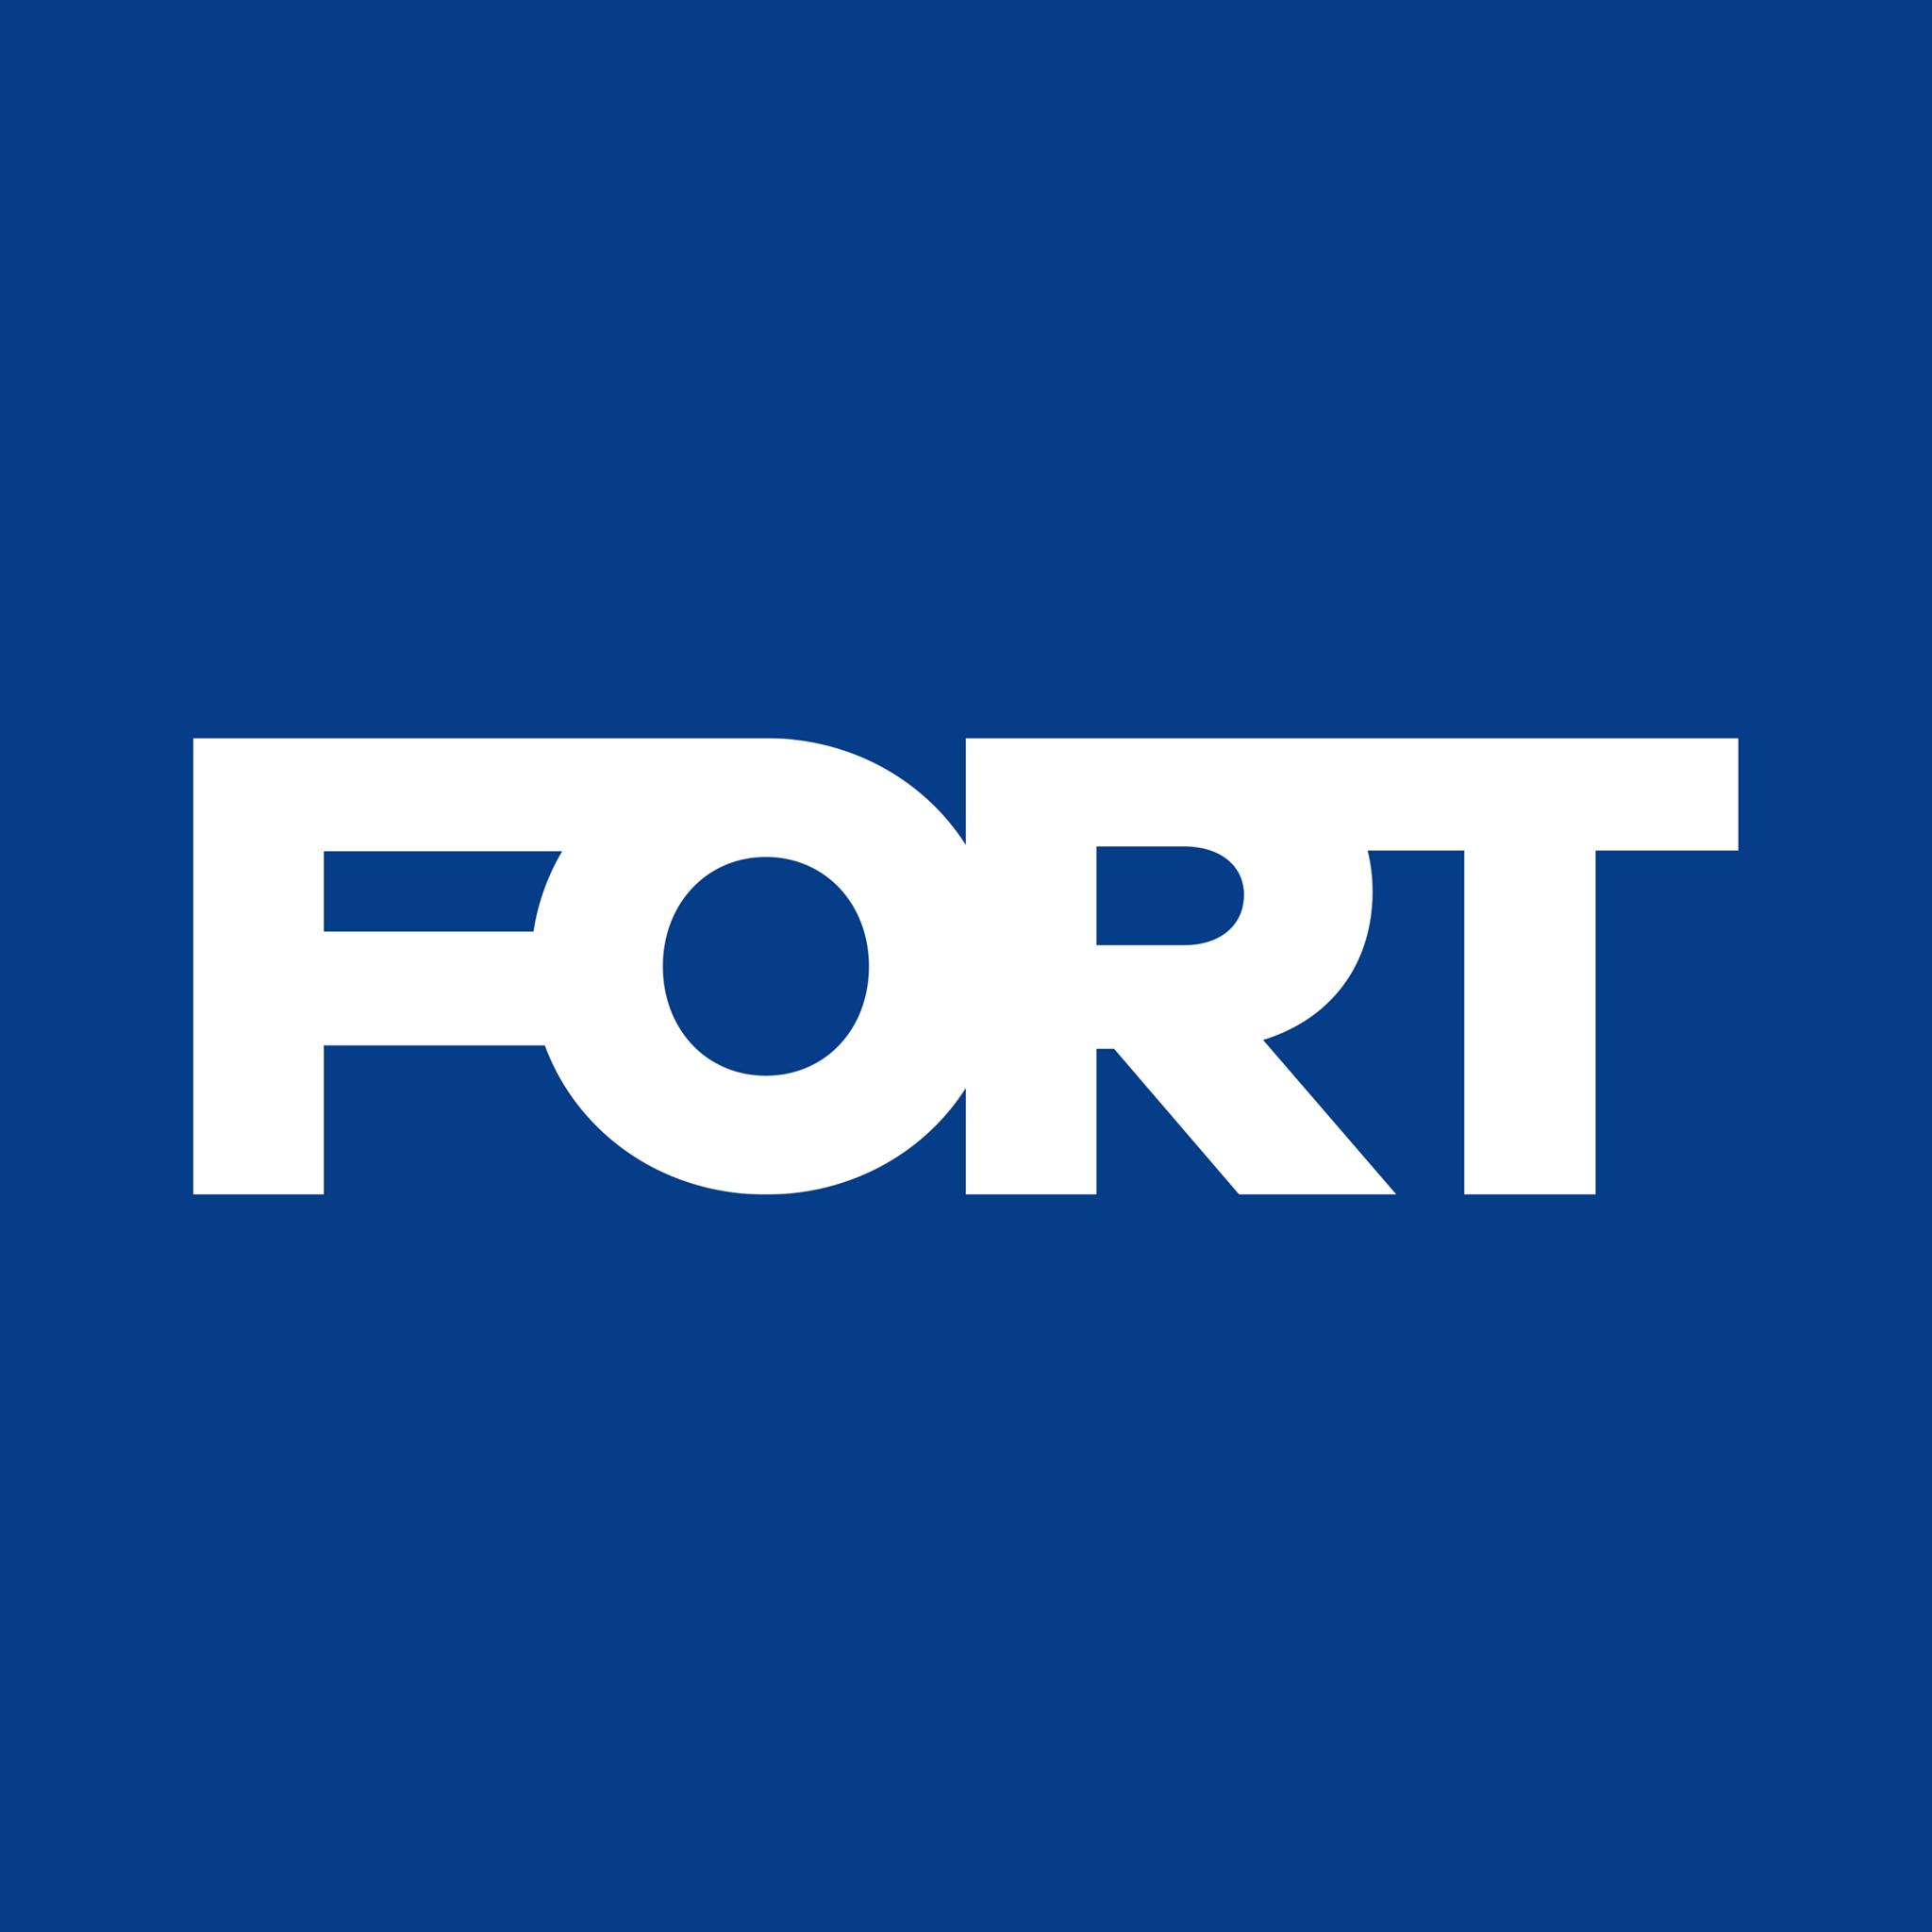 FORT Robotics